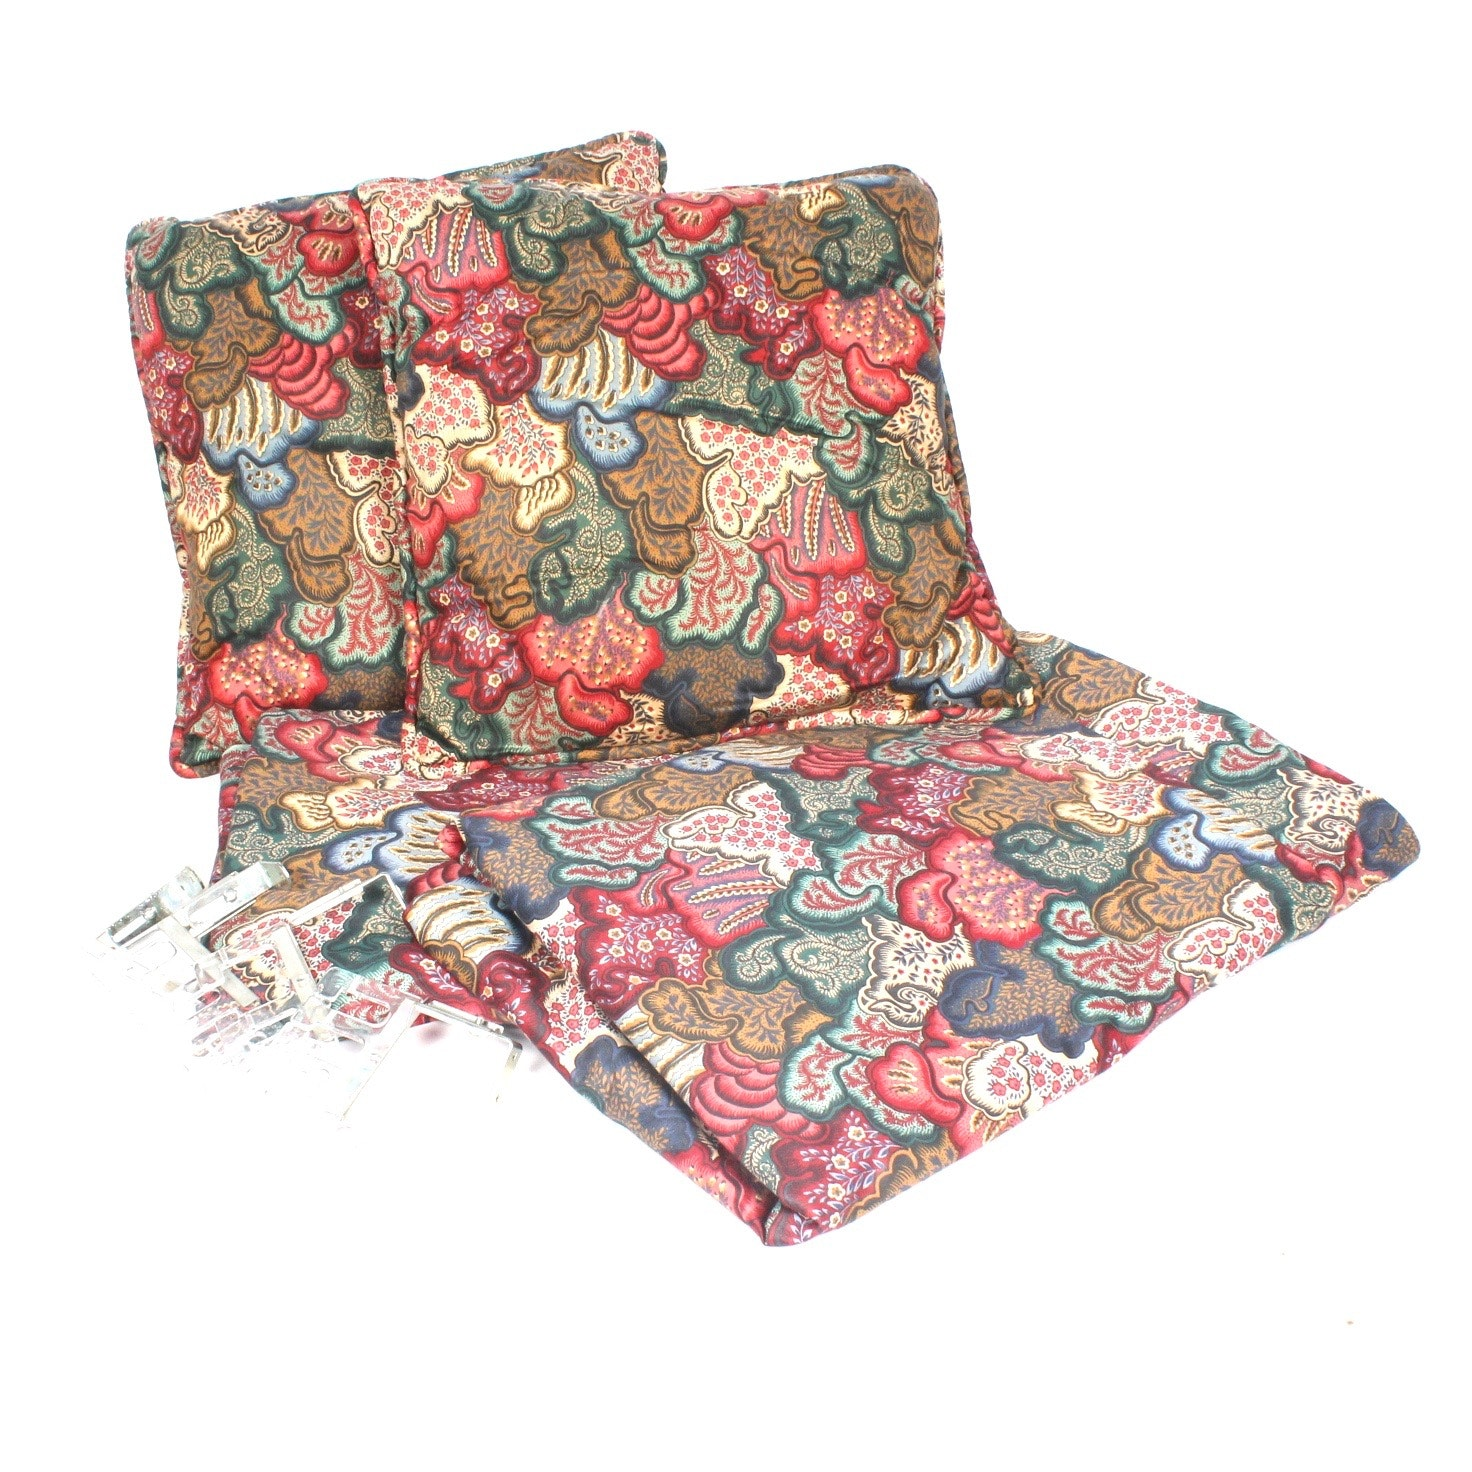 Long Curtain Panels and Throw Pillows